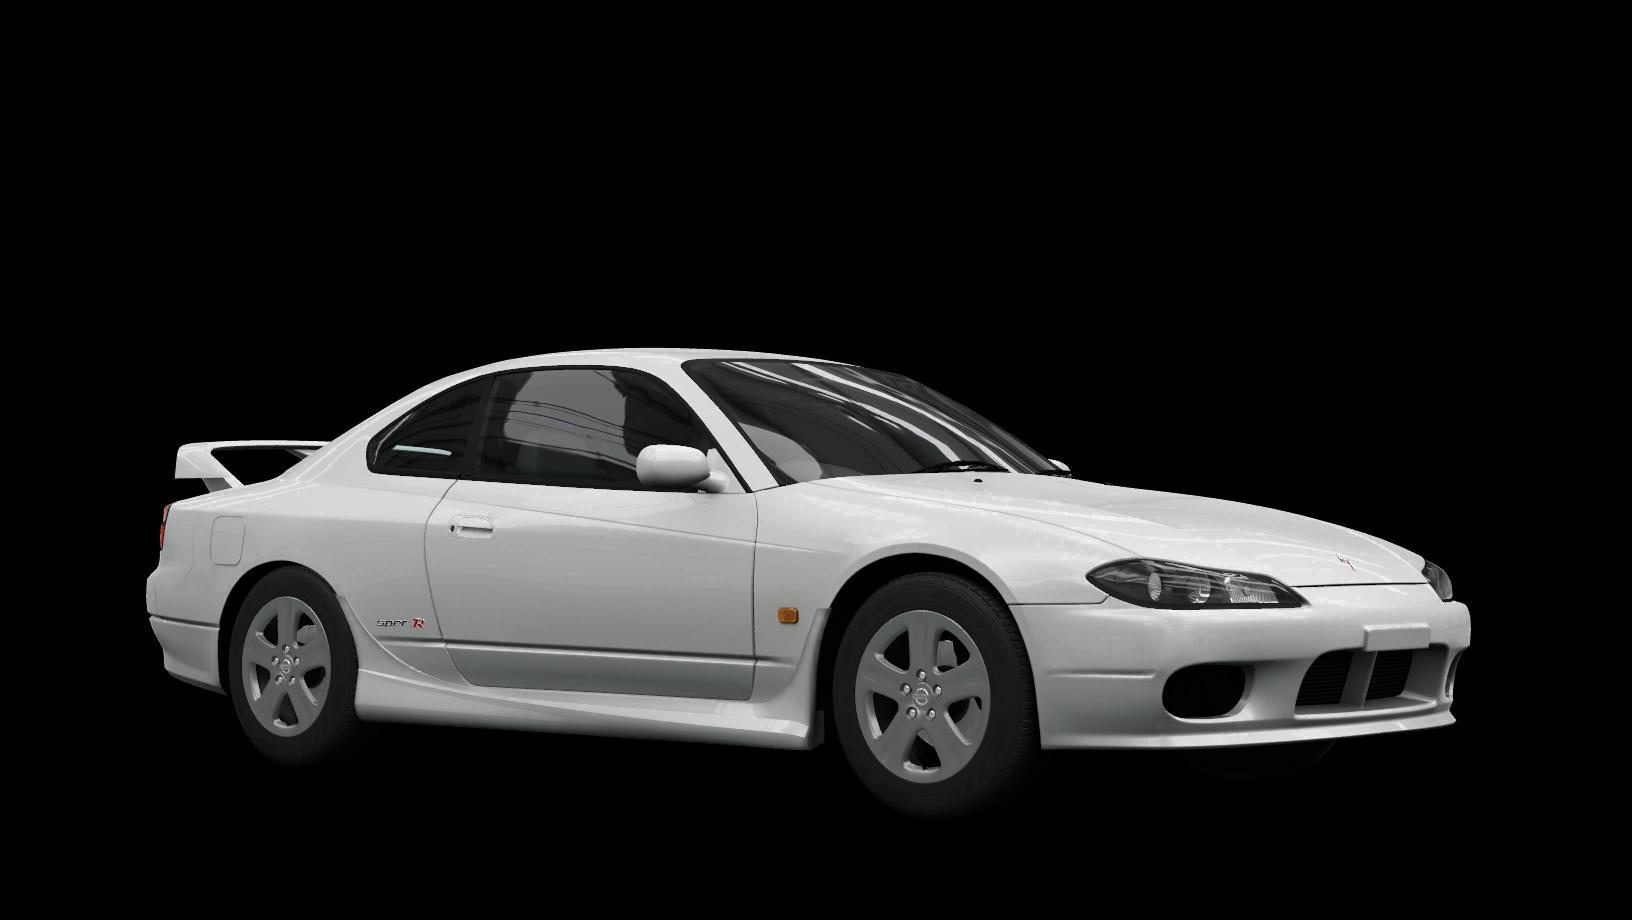 Nissan Silvia Spec-R